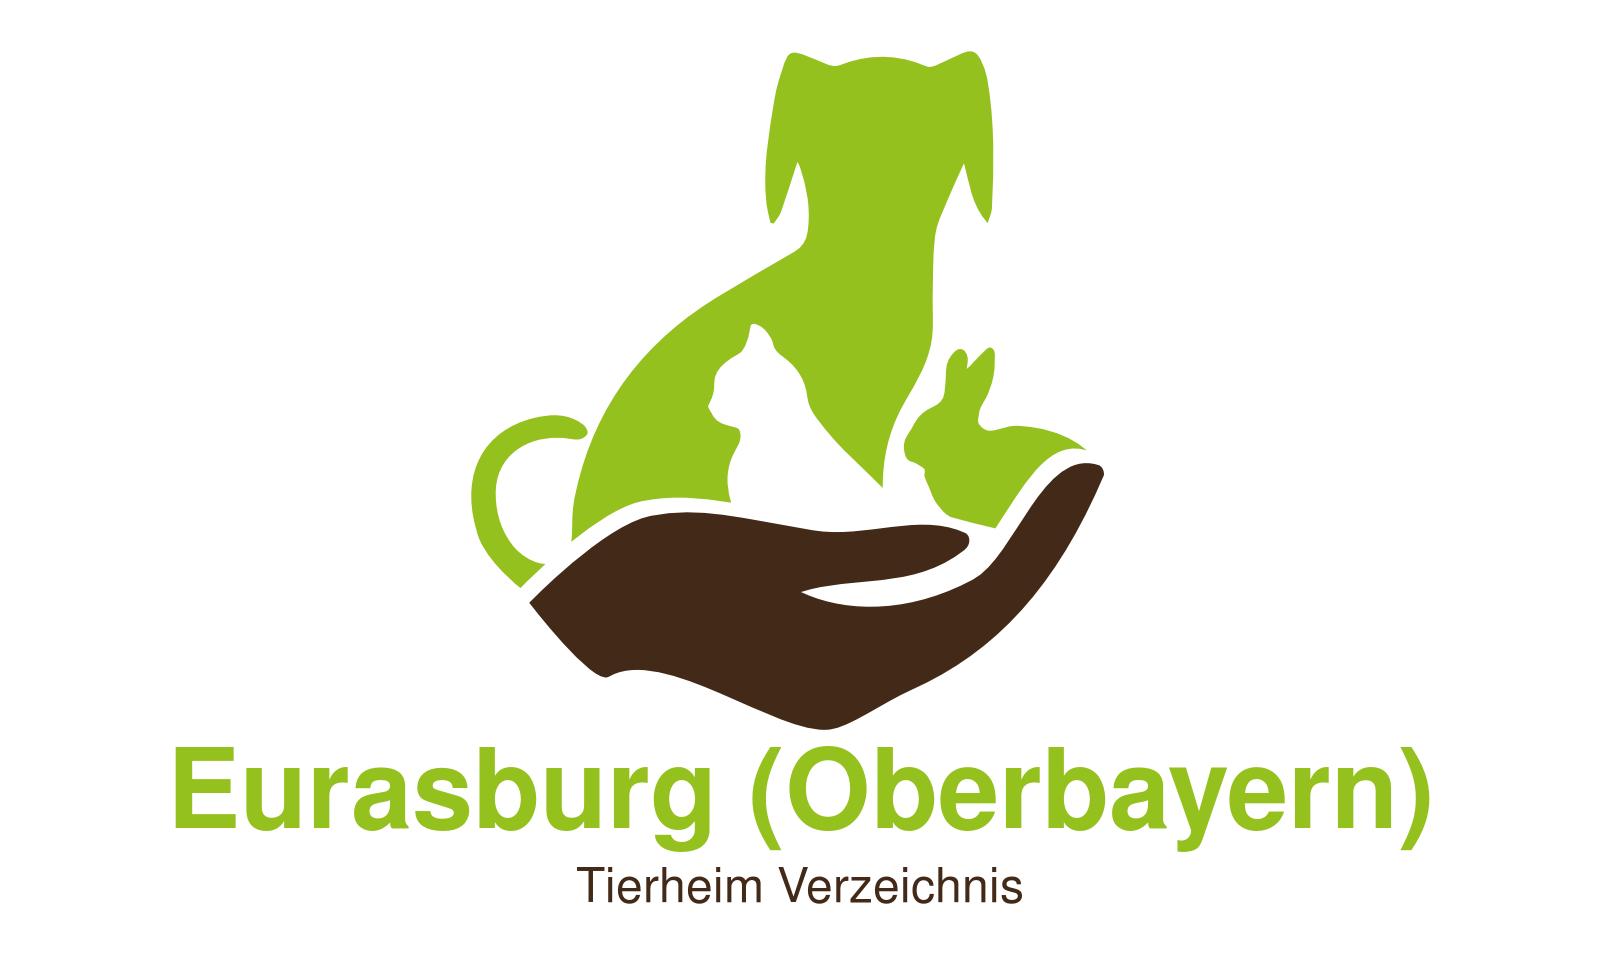 Tierheim Eurasburg (Oberbayern)